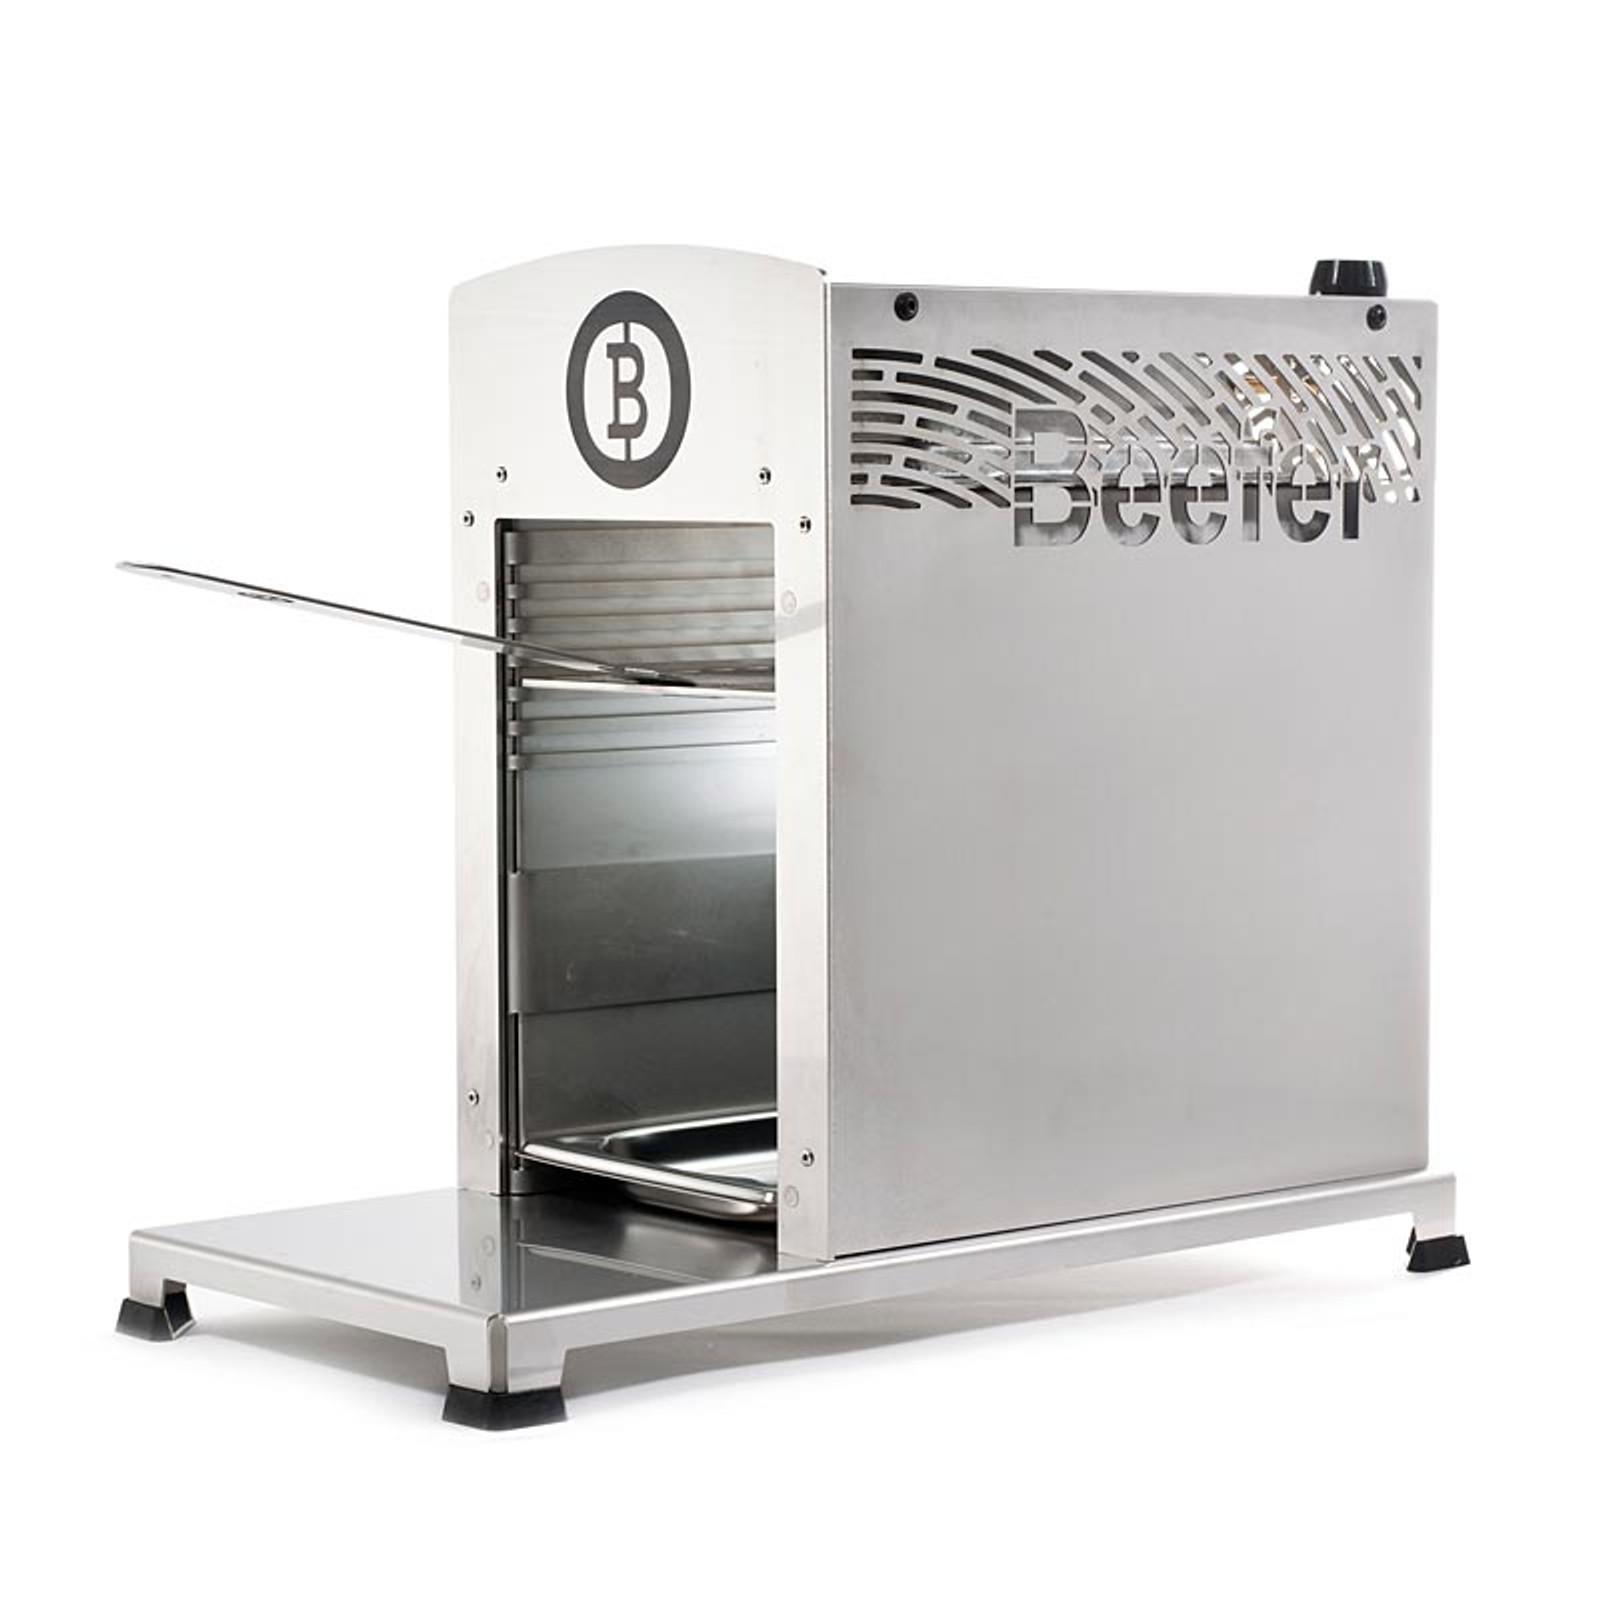 Beefer Gas Grill One Pro Fur Das Perfekte Steak 800 C